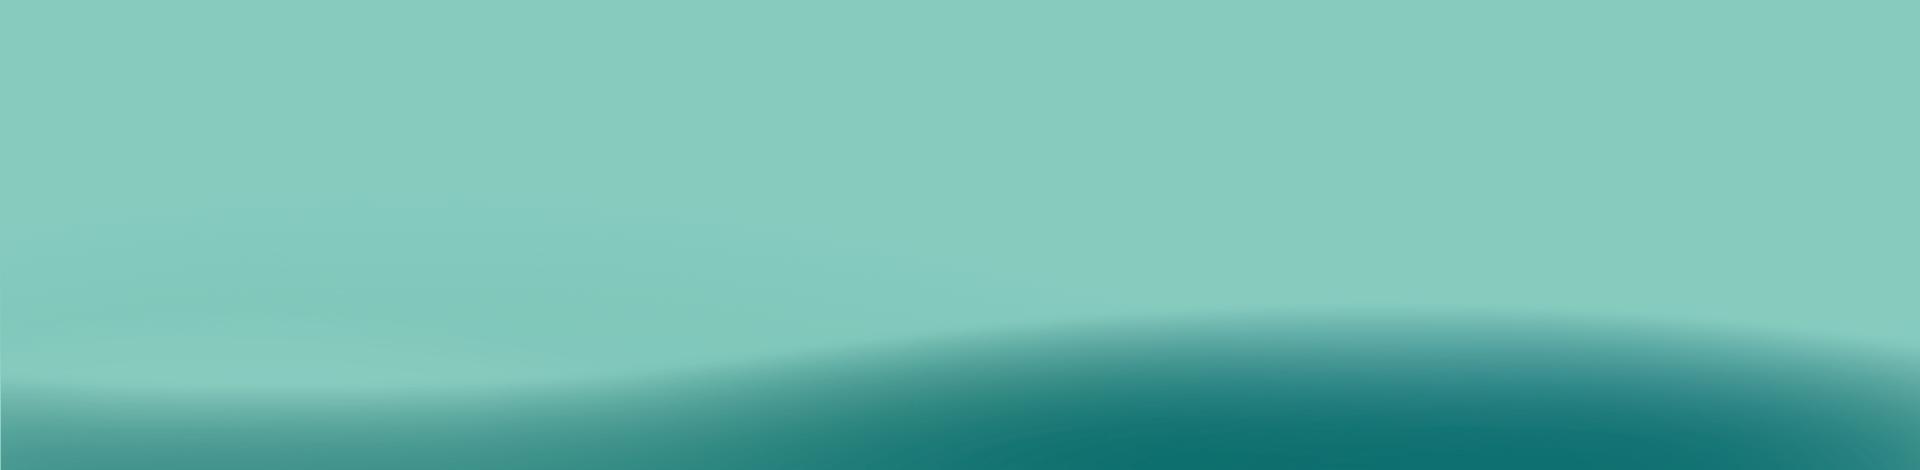 Ecological, artisanal and natural French Spirulina | Akalfood.com